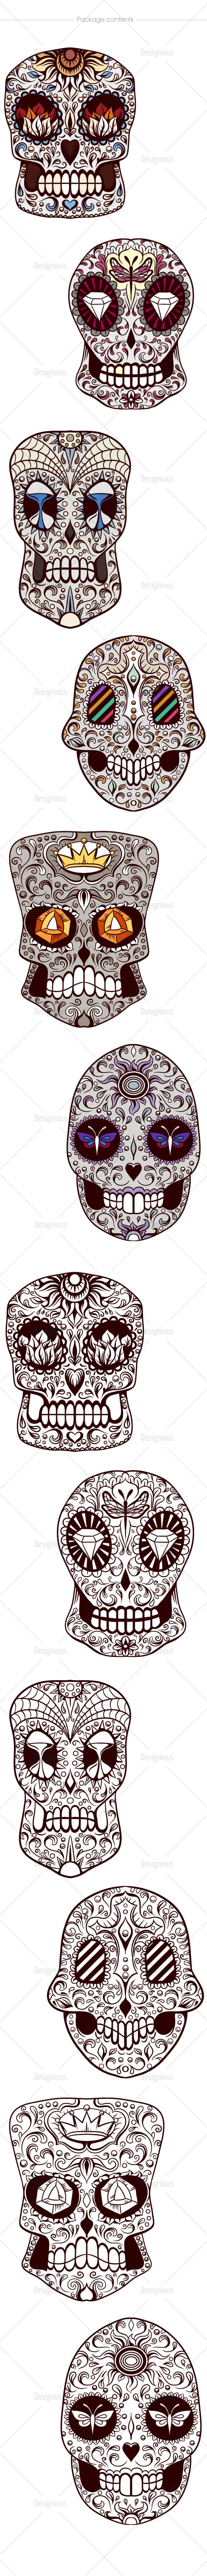 Sugar Skulls Vector Pack 44 designious vector sugar skulls 44 large